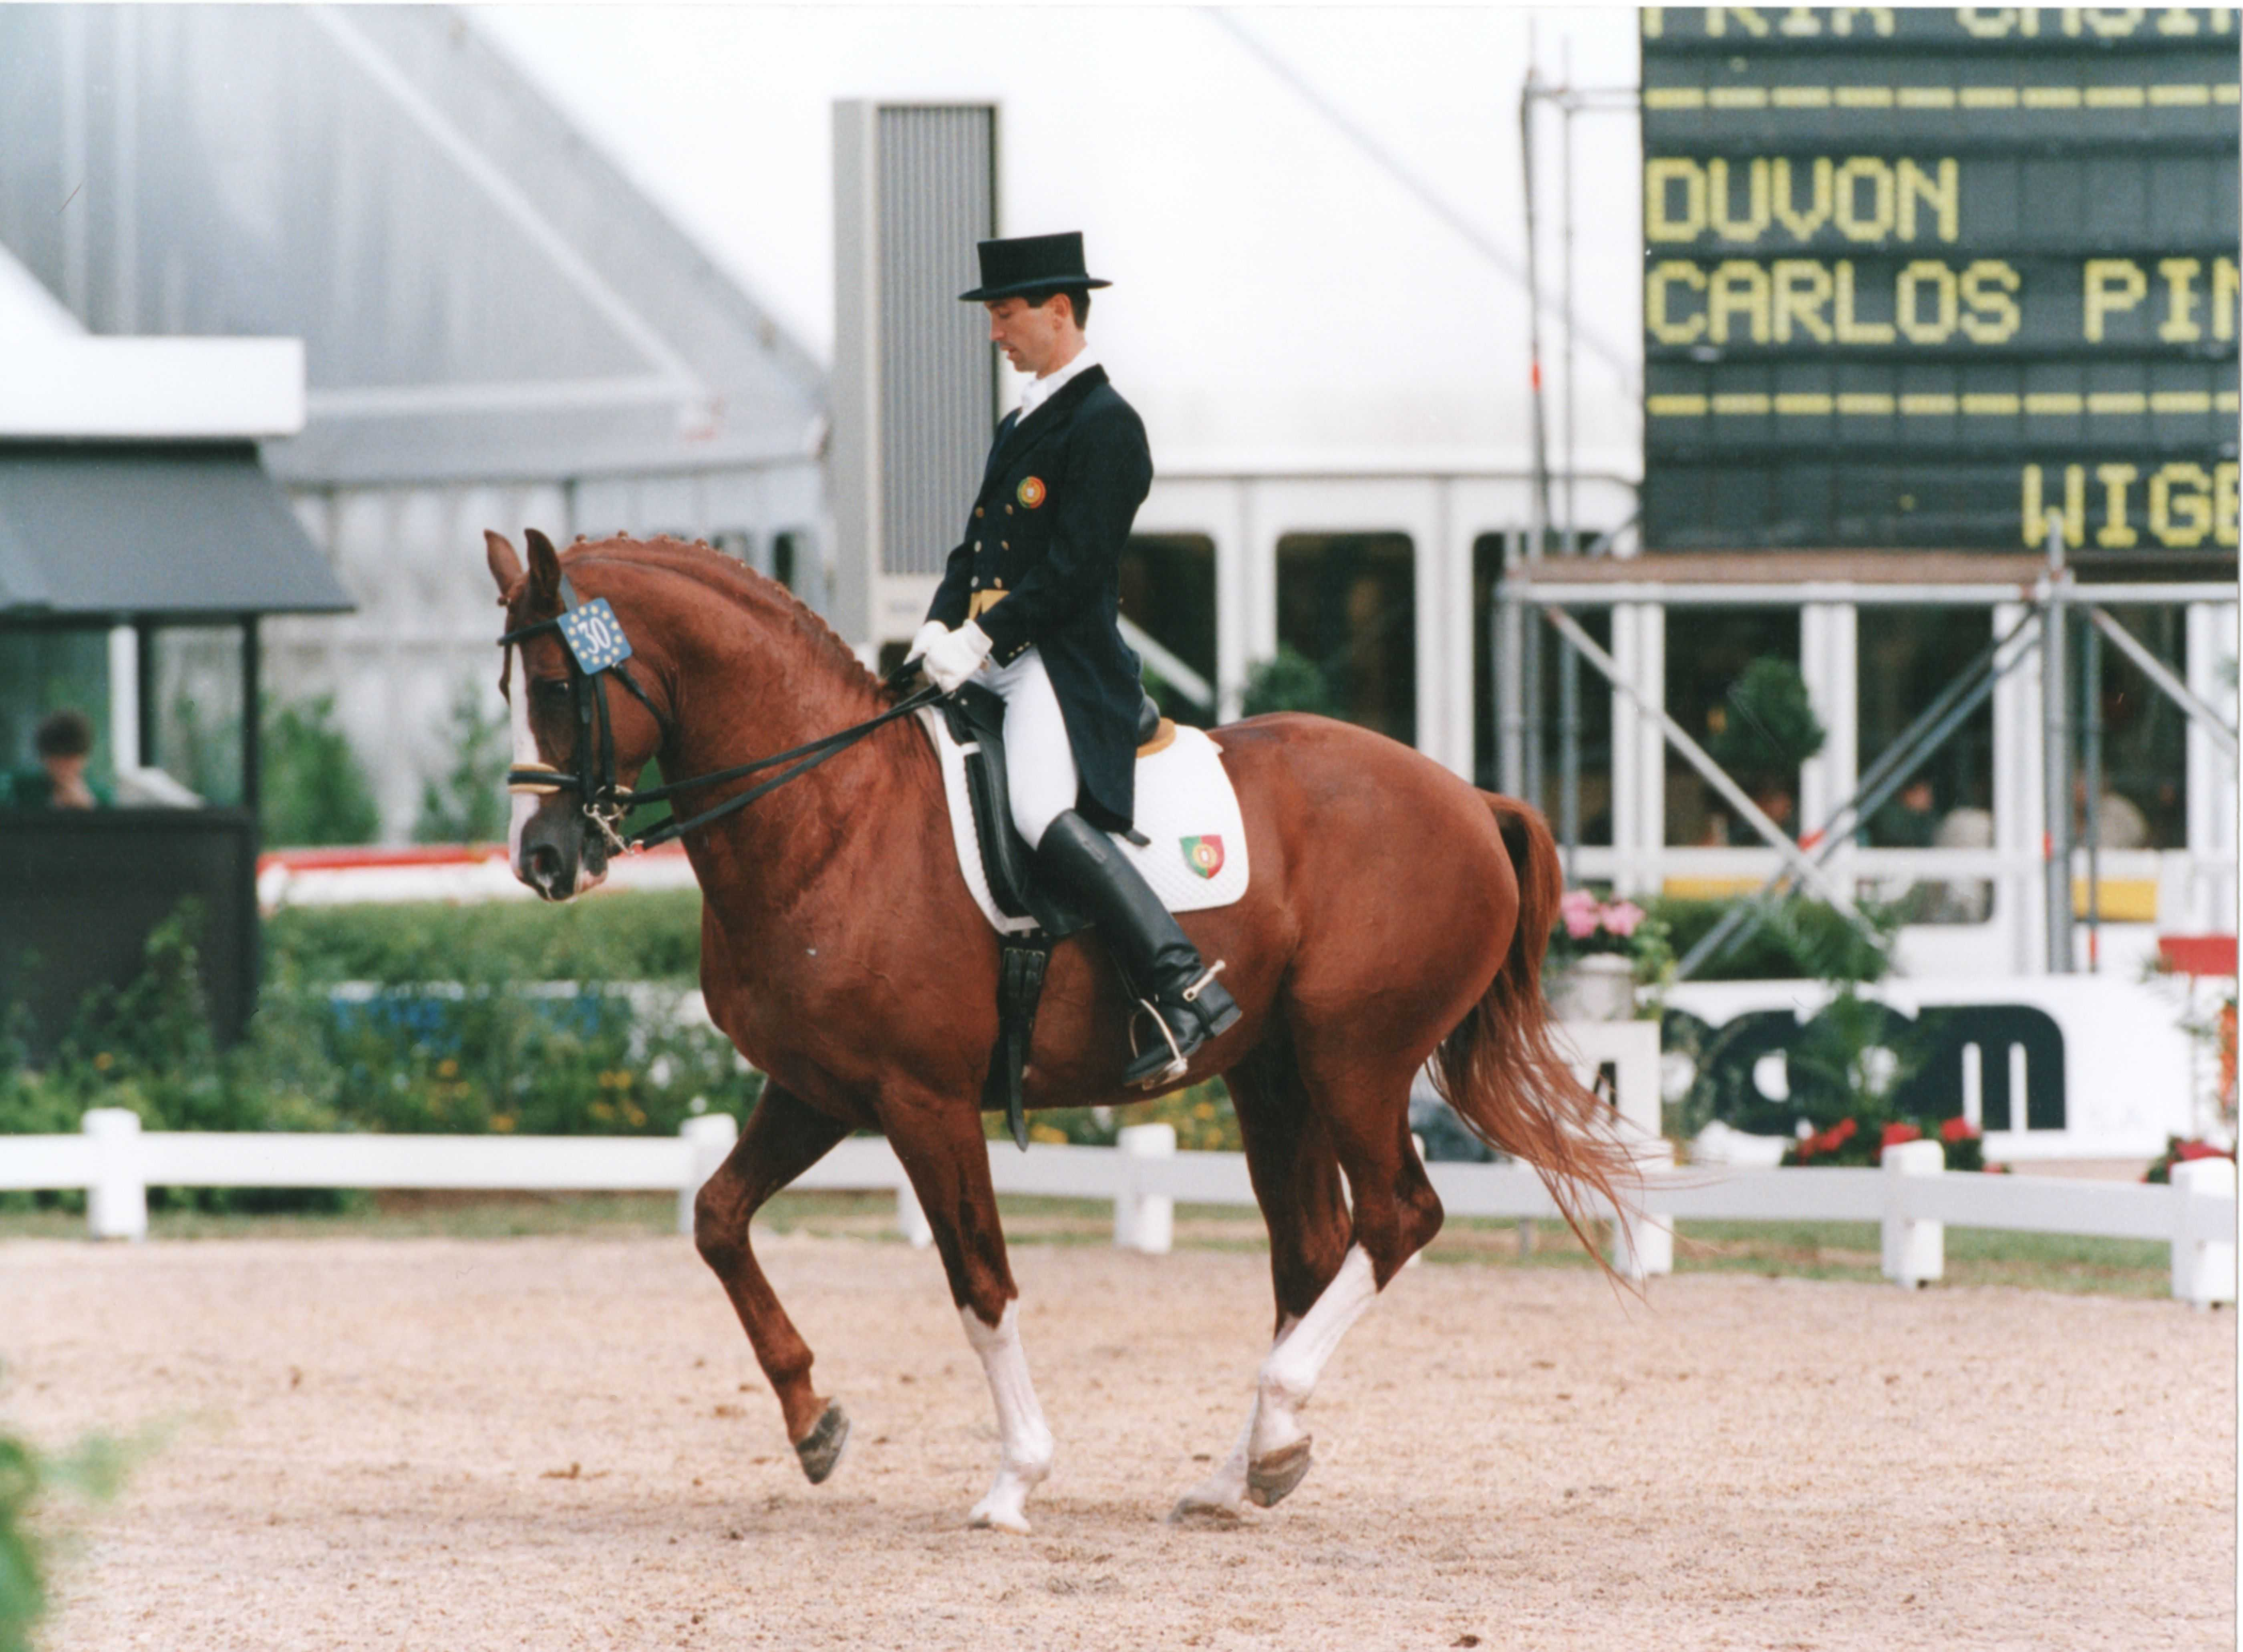 DUVON - Champ. Europe Luxembourg 1995